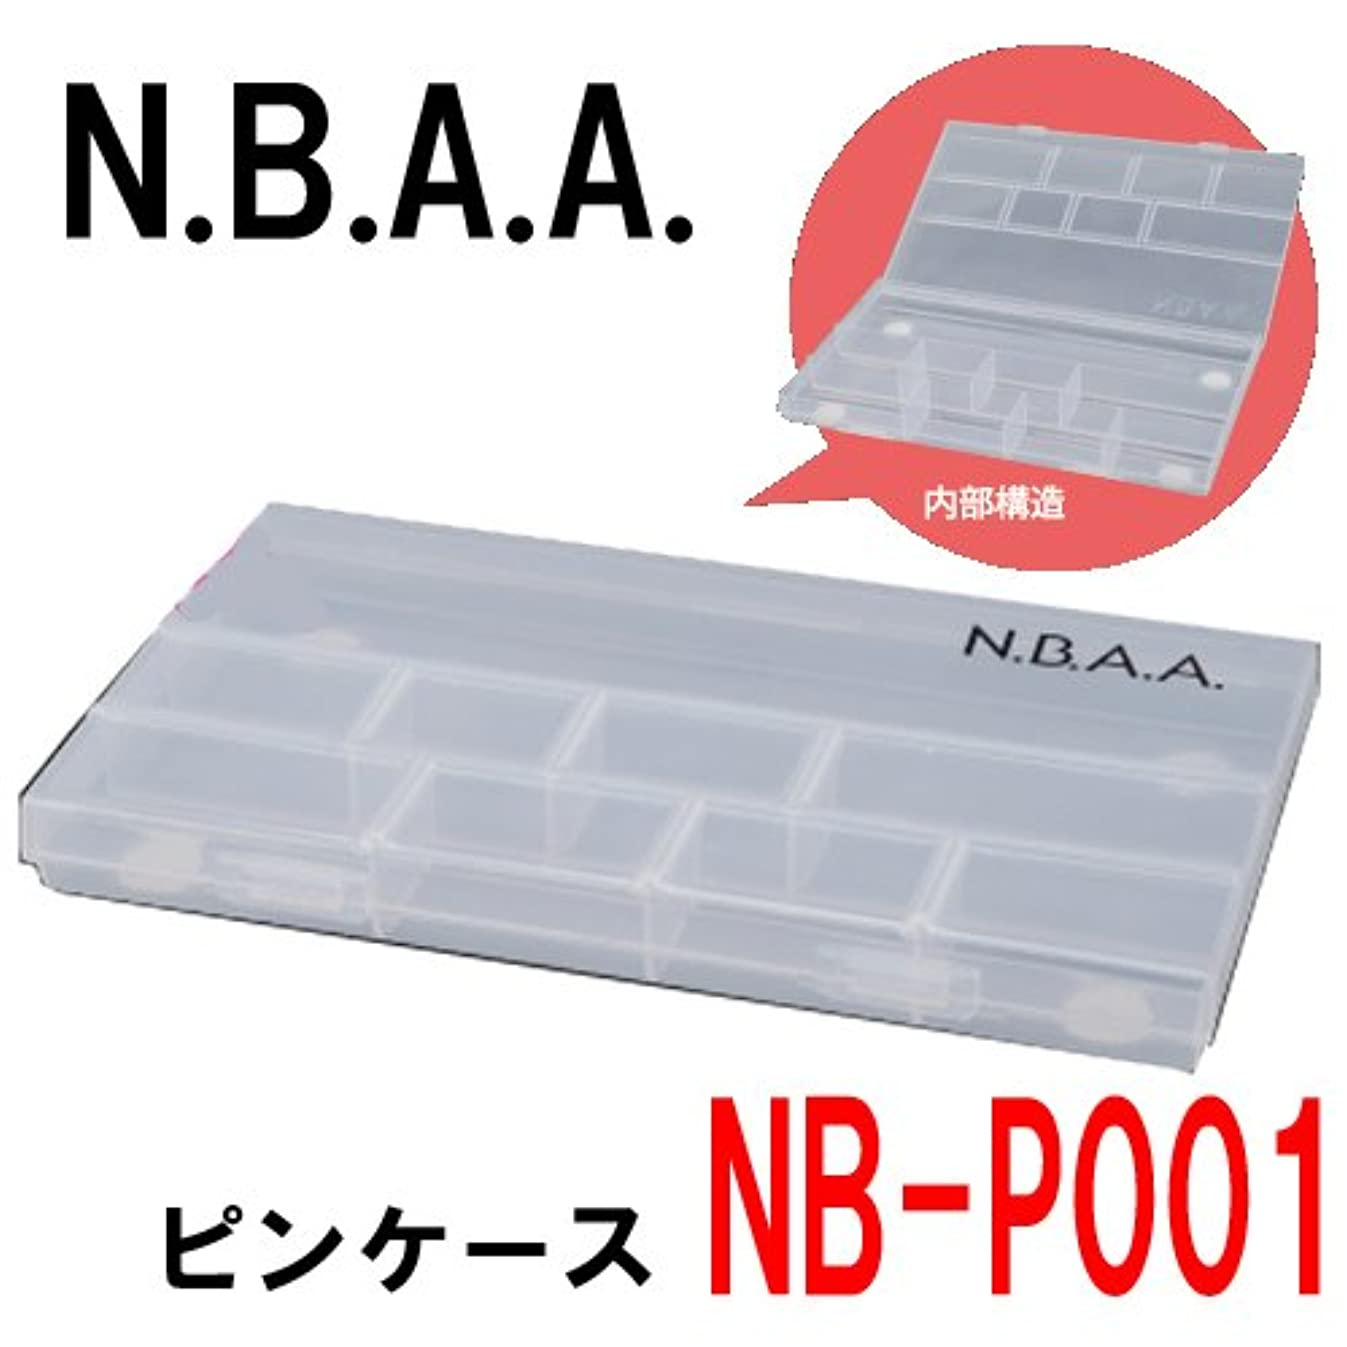 侵略周辺希少性N.B.A.A. NB-P001 ピンケース